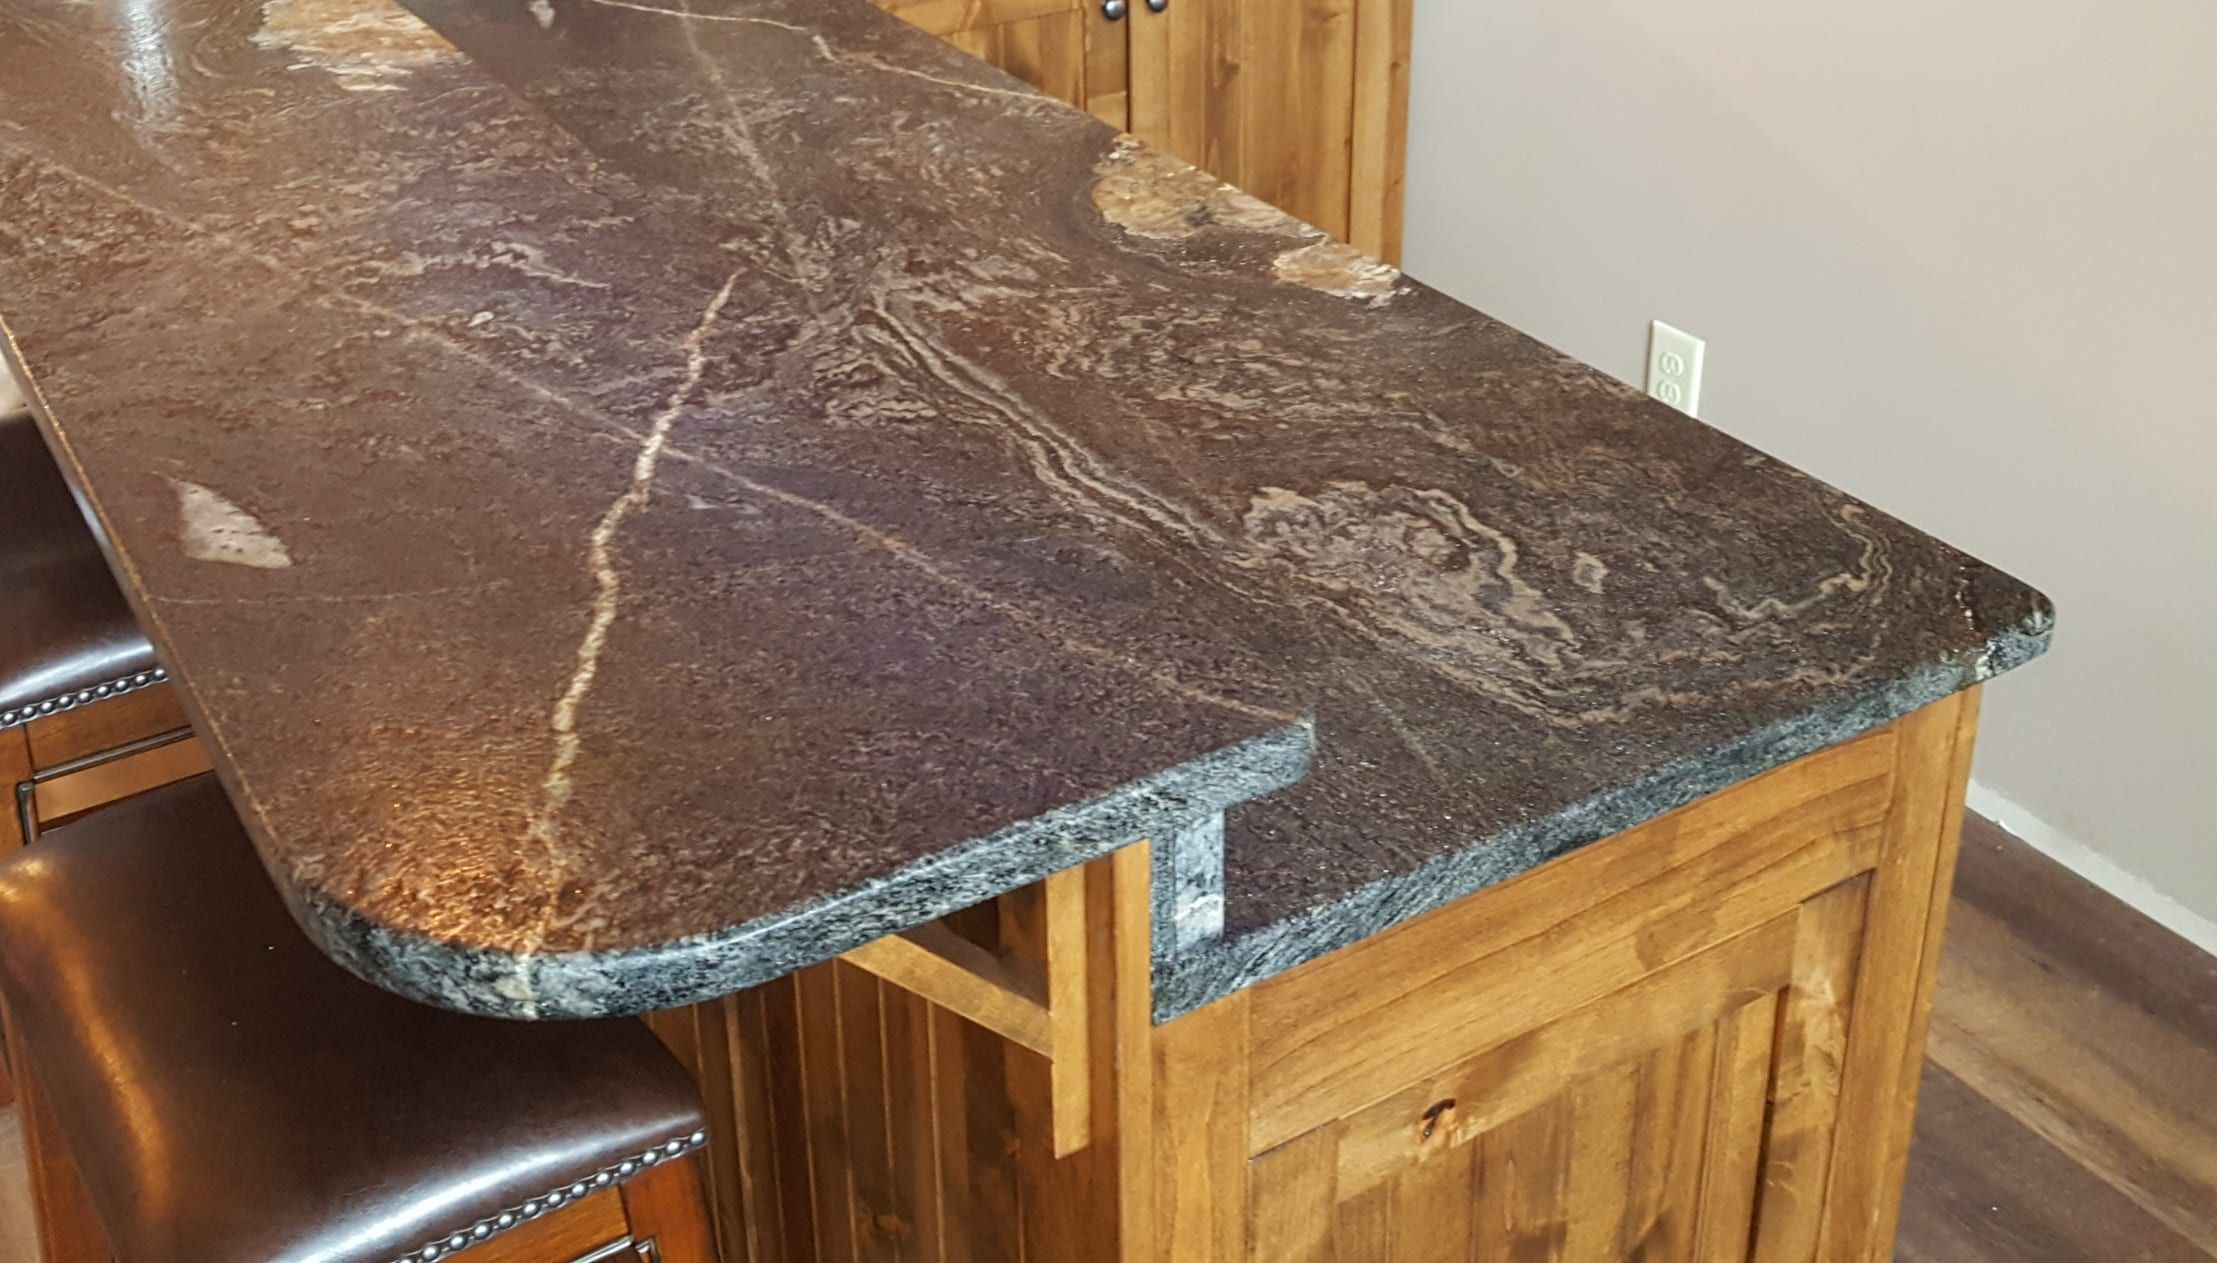 Type Of Job Kitchen Countertops Material Granite Color Astrus Black Edge Demi Bullnose Sink Sb 708 Large Prep 18g Ss Um Designer Mayeli Medina